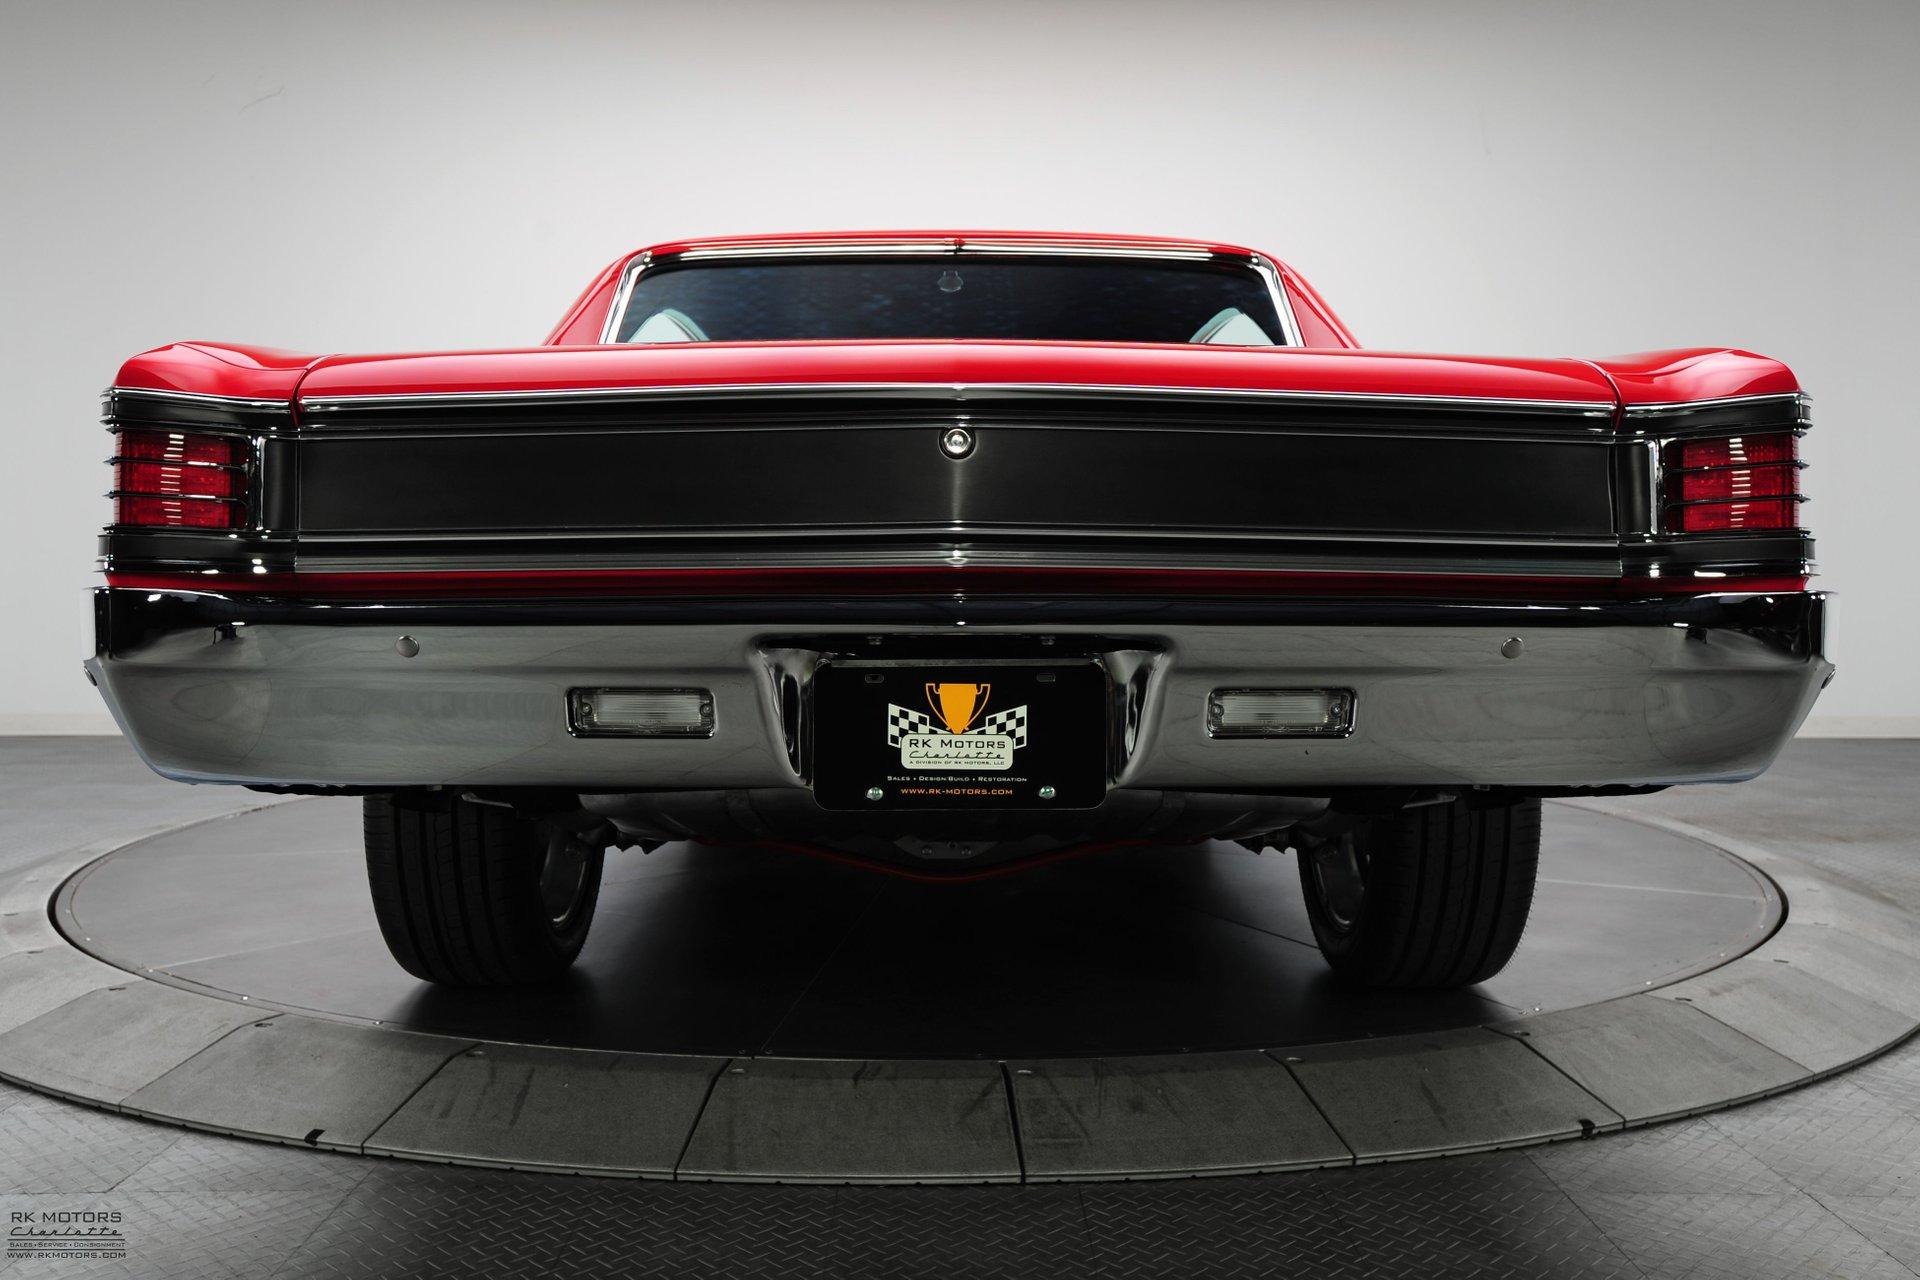 132870 1967 Chevrolet Chevelle RK Motors Classic Cars for Sale